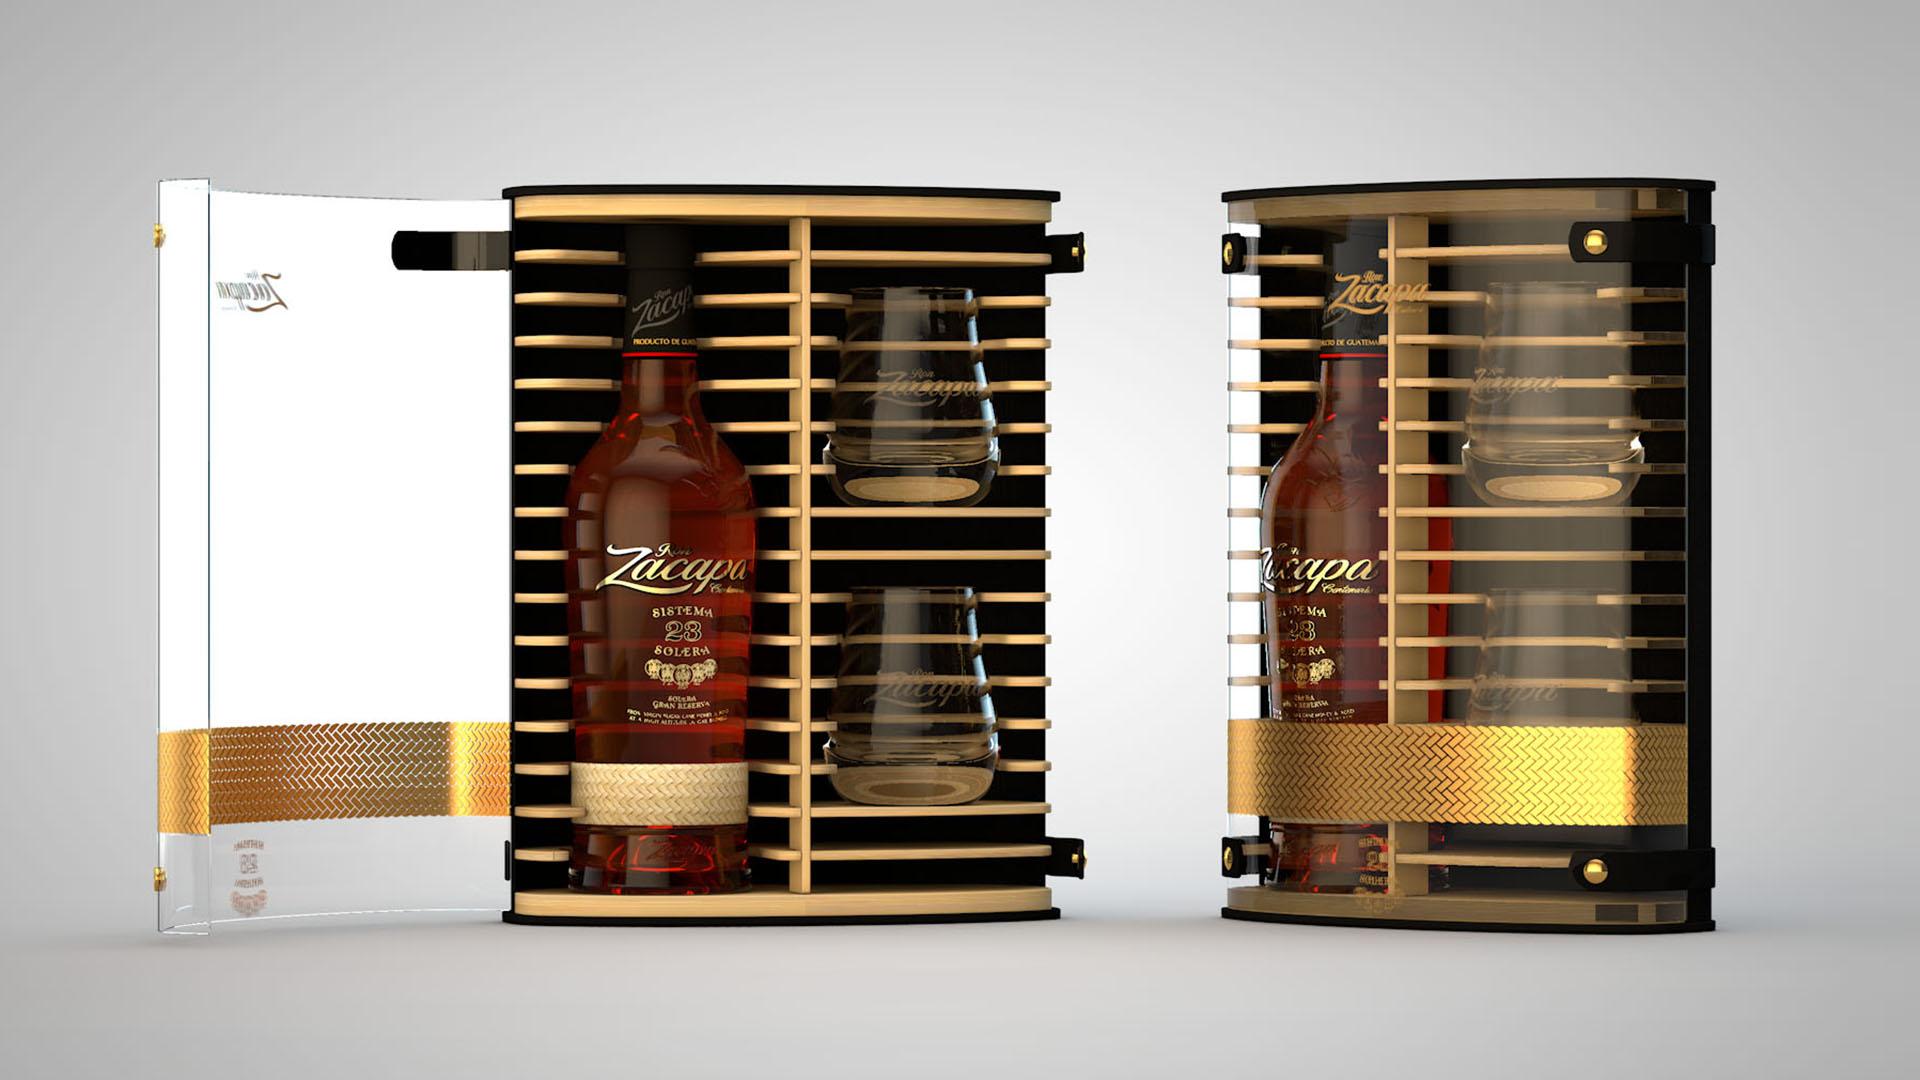 Zacapa 23 Gifting Pack